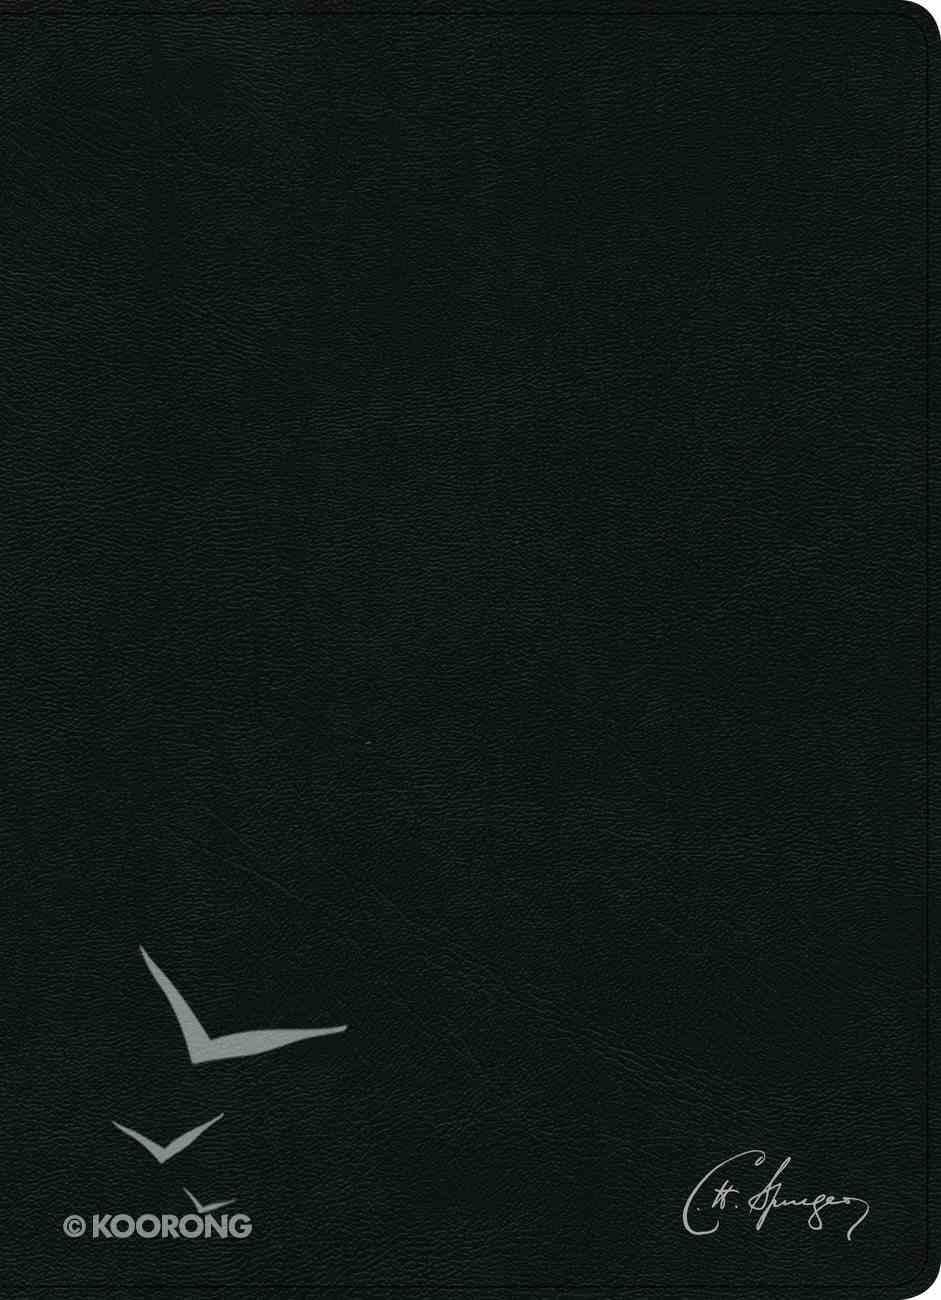 Rvr 1960 Biblia De Estudio Spurgeon Negro Genuine Leather